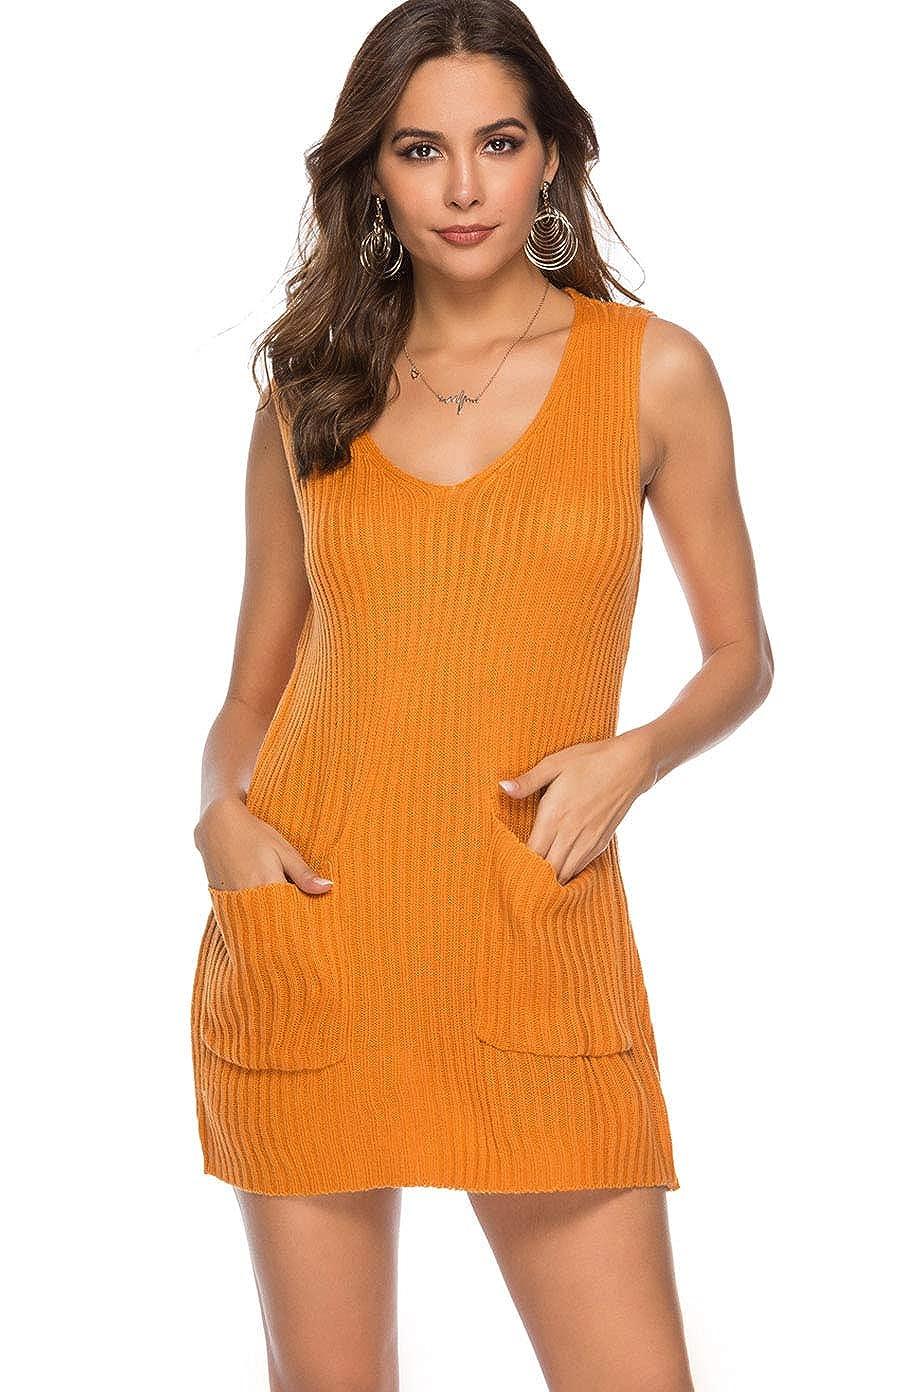 5cee147efc36 Koitmy Womens V Neck Sleeveless Knit Loose Tank Sweater Dresses with  Pockets at Amazon Women s Clothing store